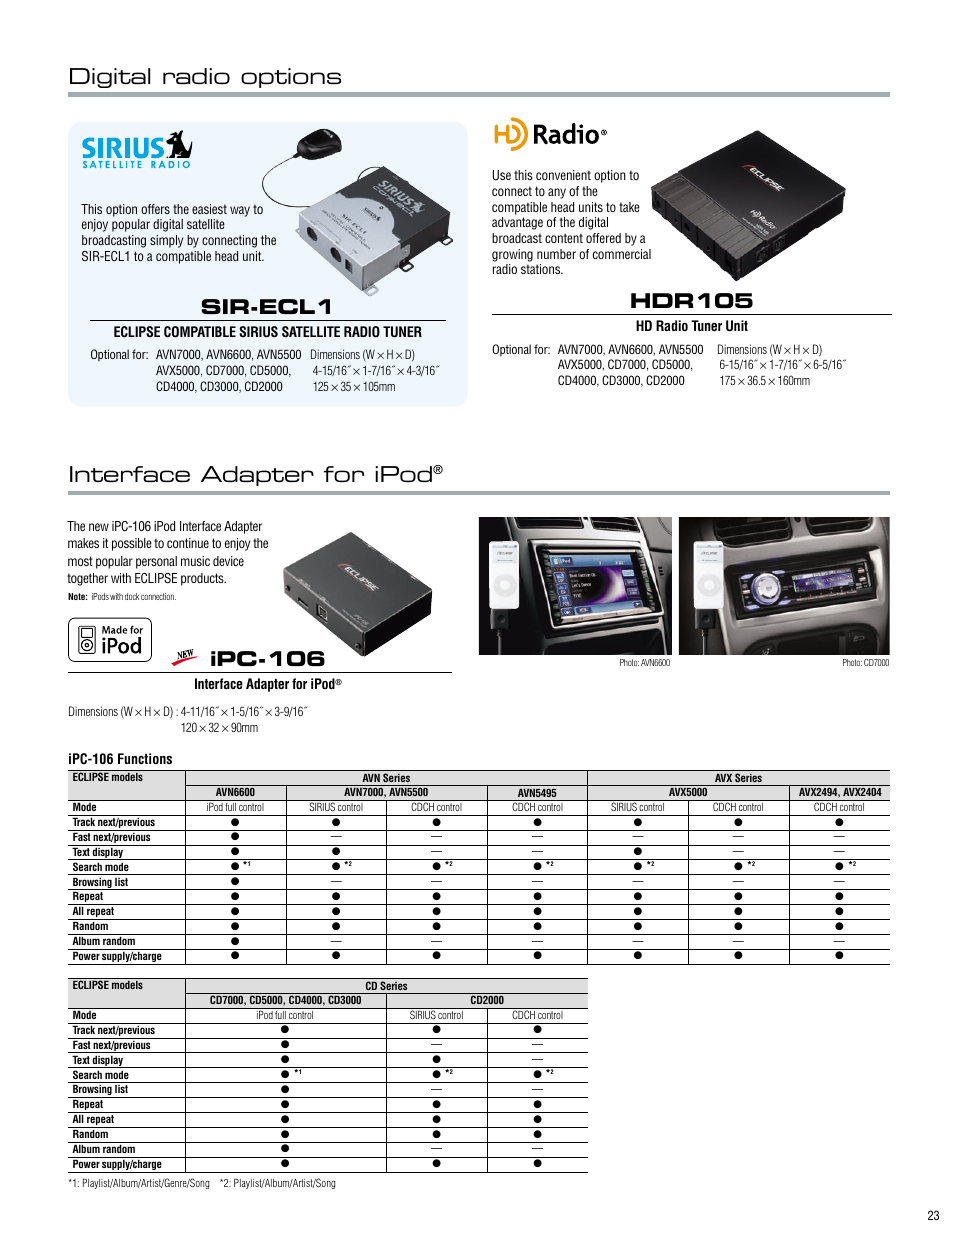 digital radio options interface adapter for ipod sir ecl1 rh manualsdir com Eclipse Navigation AVN 5500 Manual Eclipse Car Audio